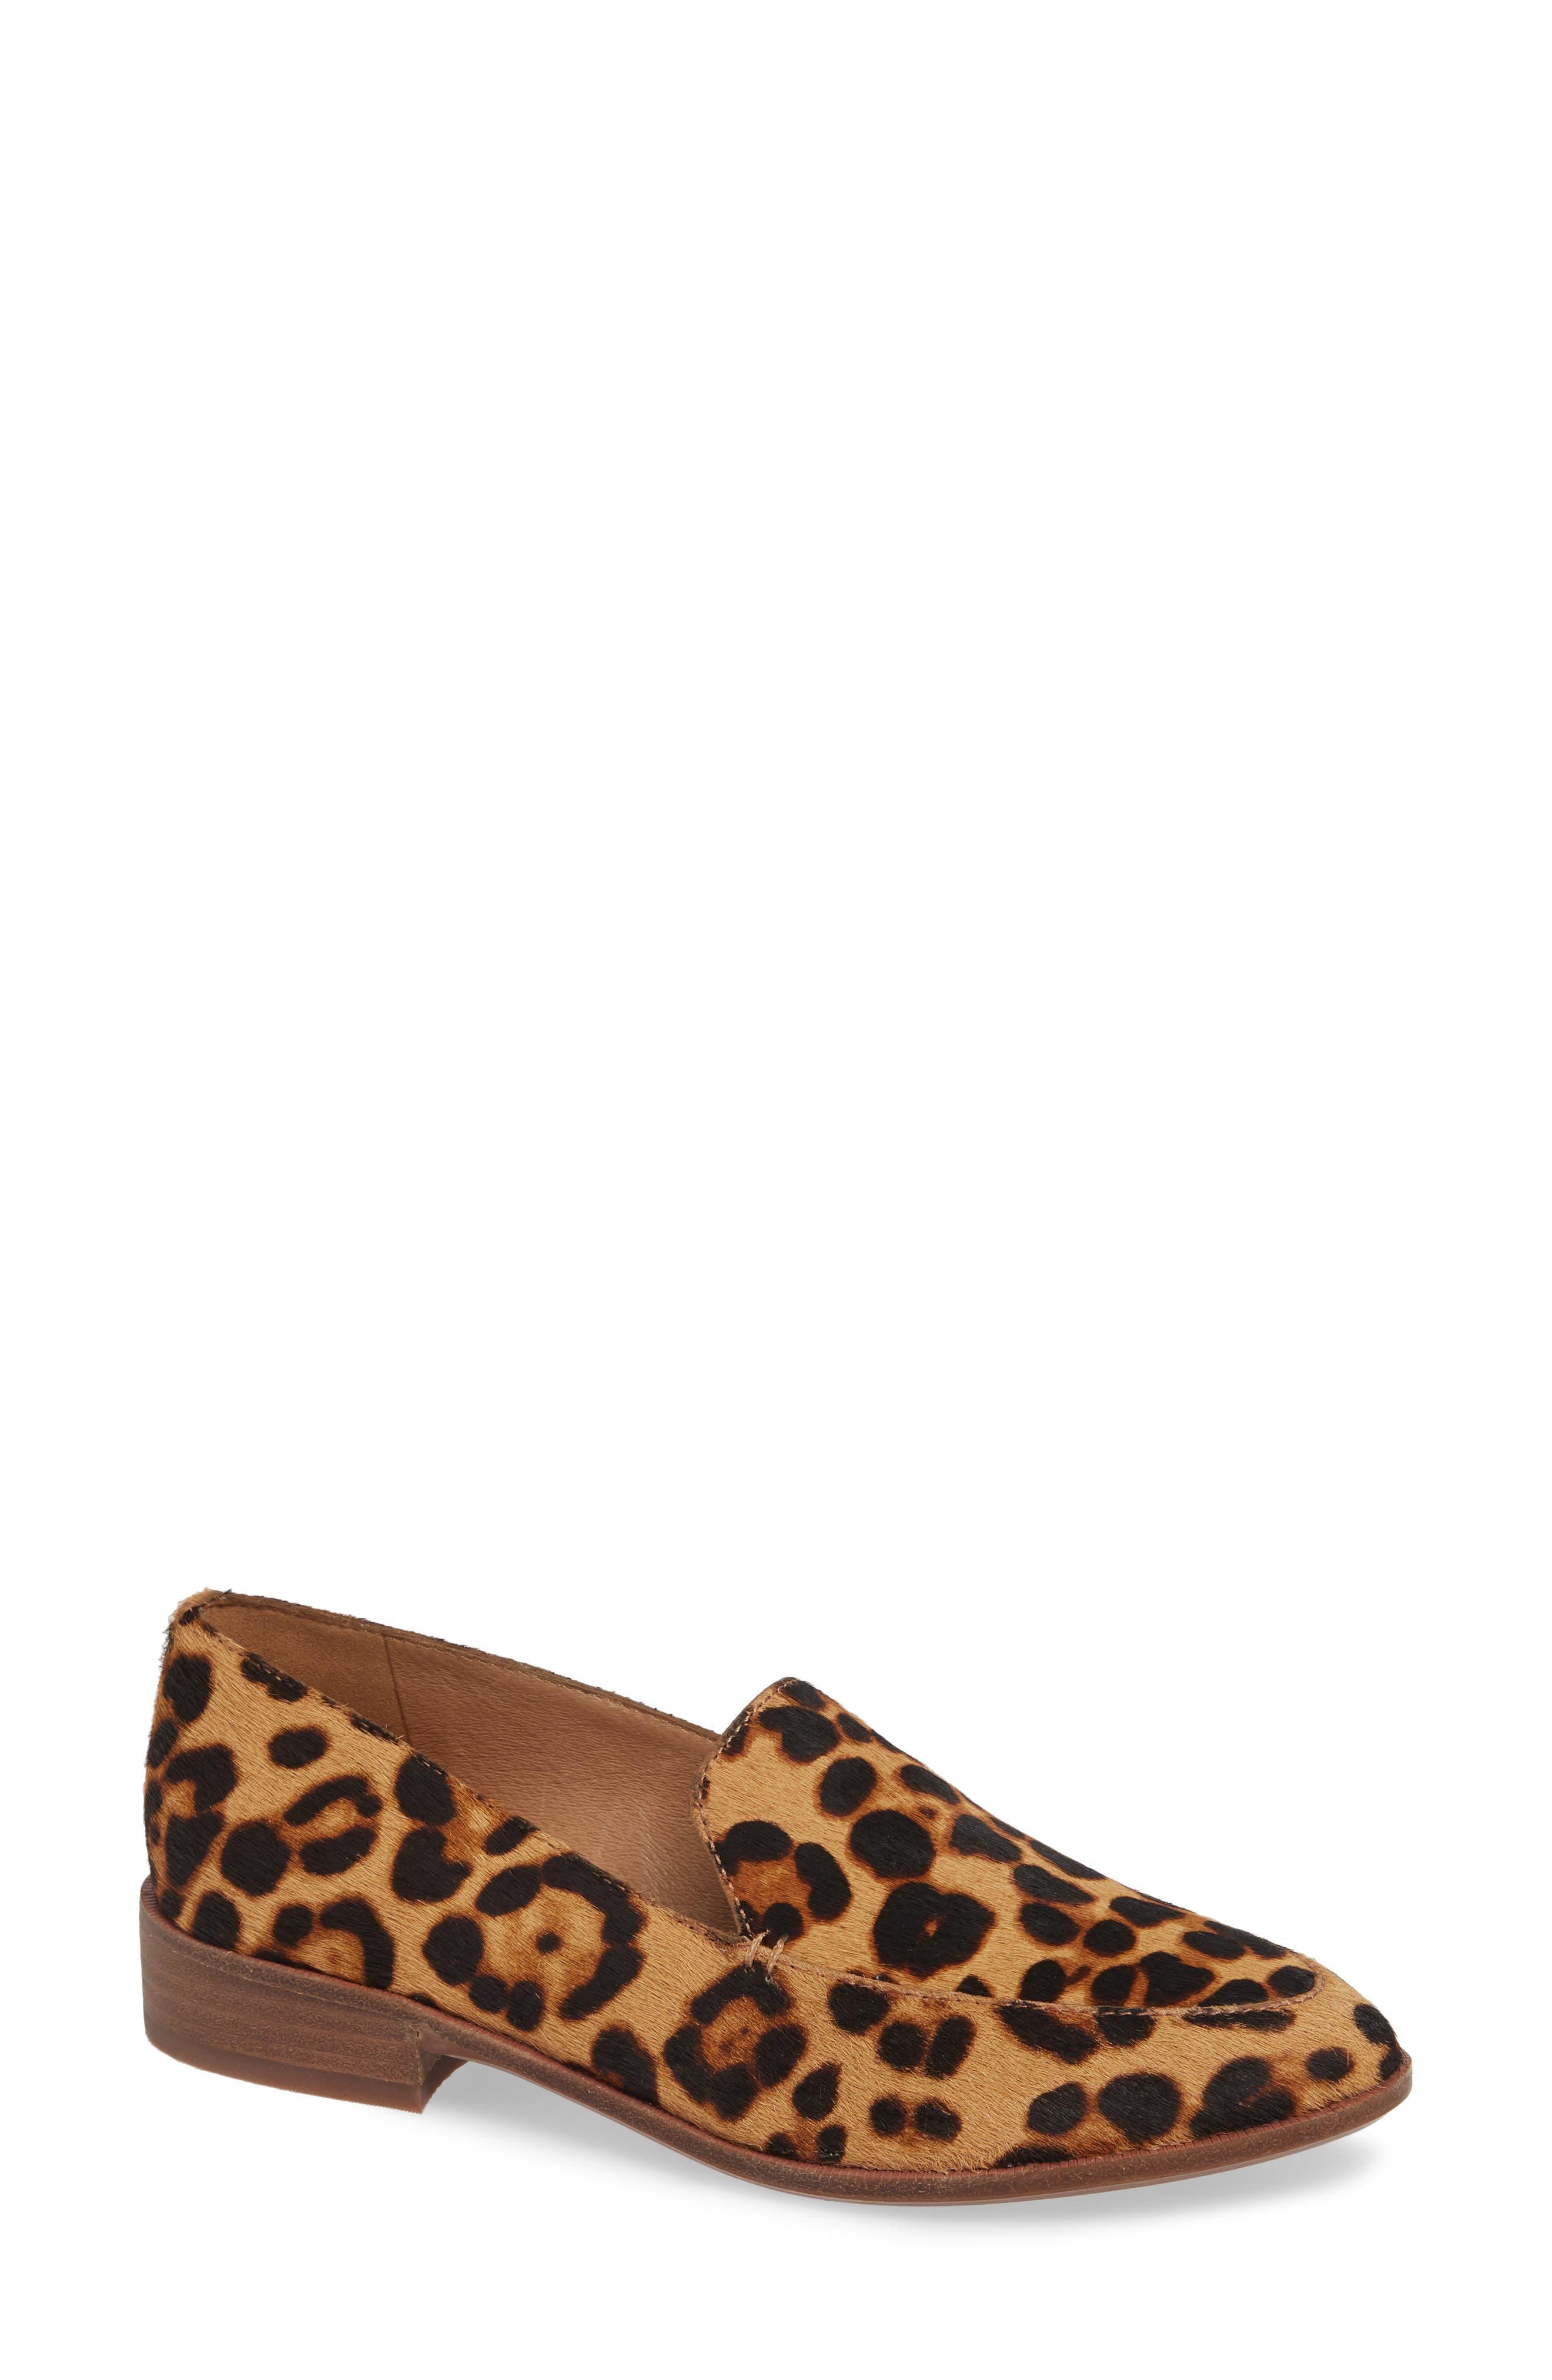 MADEWELL,                             The Frances Genuine Calf Hair Loafer,                             Main thumbnail 1, color,                             TRUFFLE MULTI LEOPARD CALFHAIR